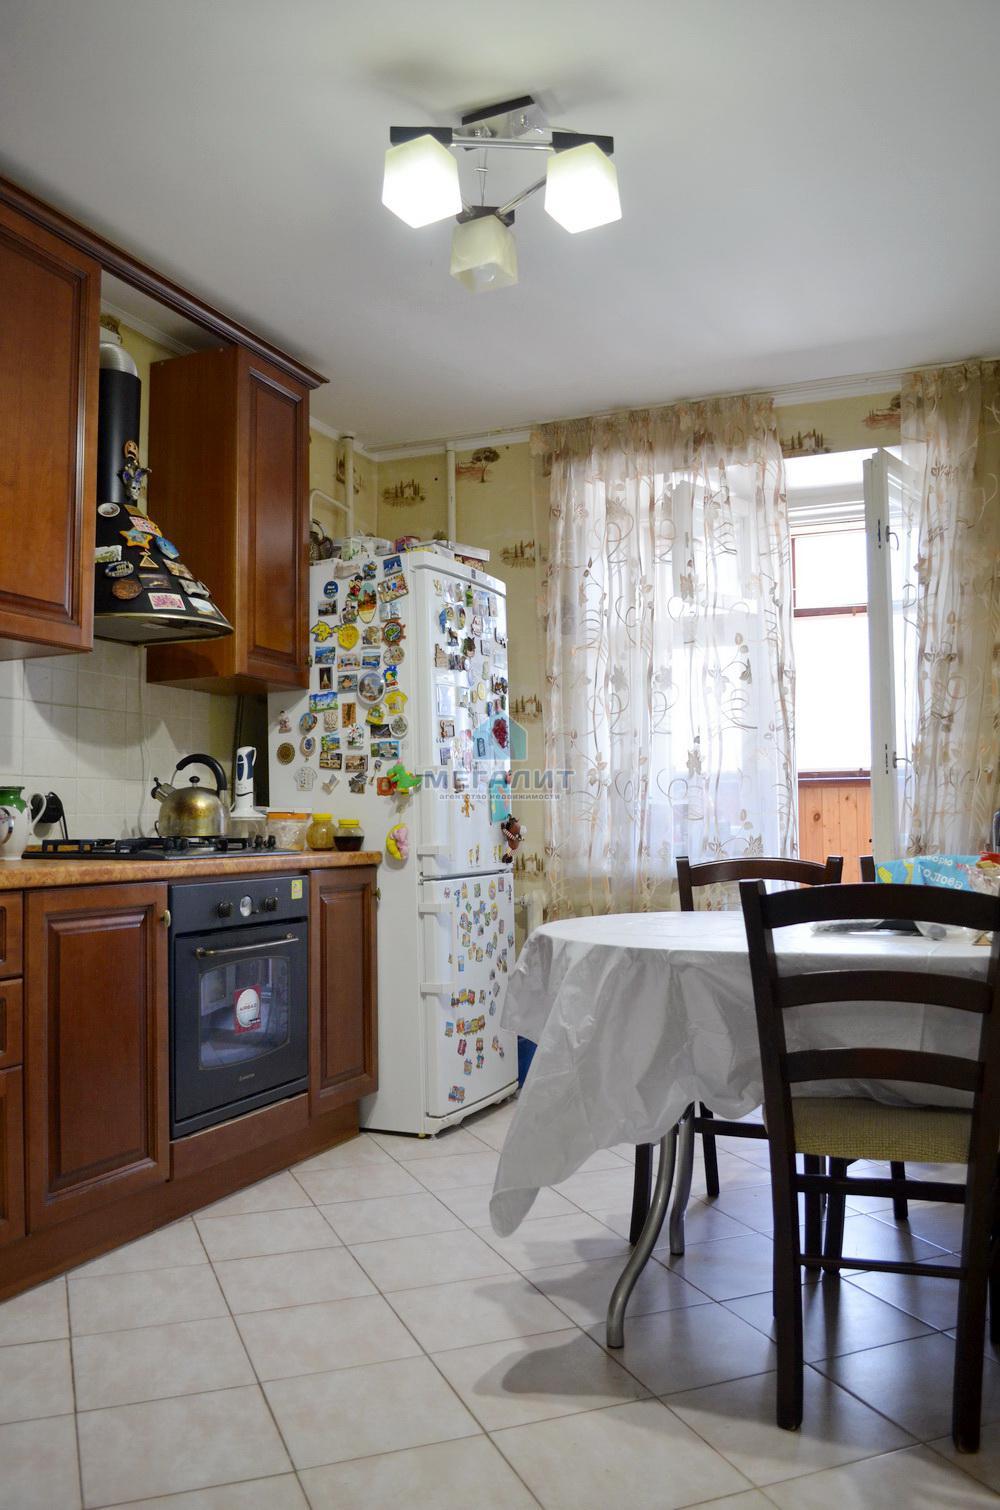 Продажа 2-к квартиры Юлиуса Фучика 82, 70 м2  (миниатюра №2)